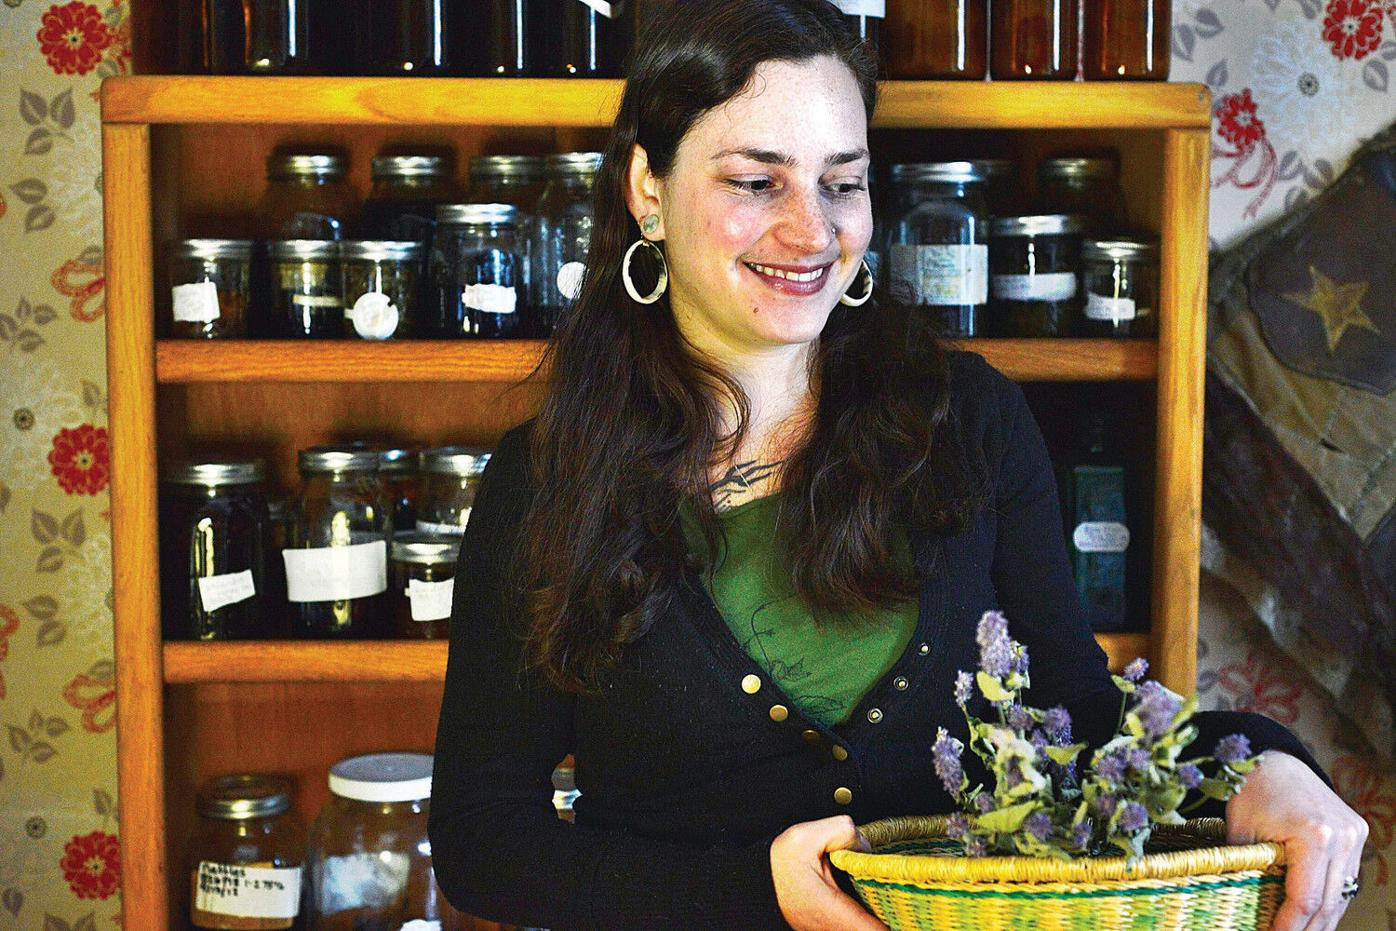 Empowerment through herbalism